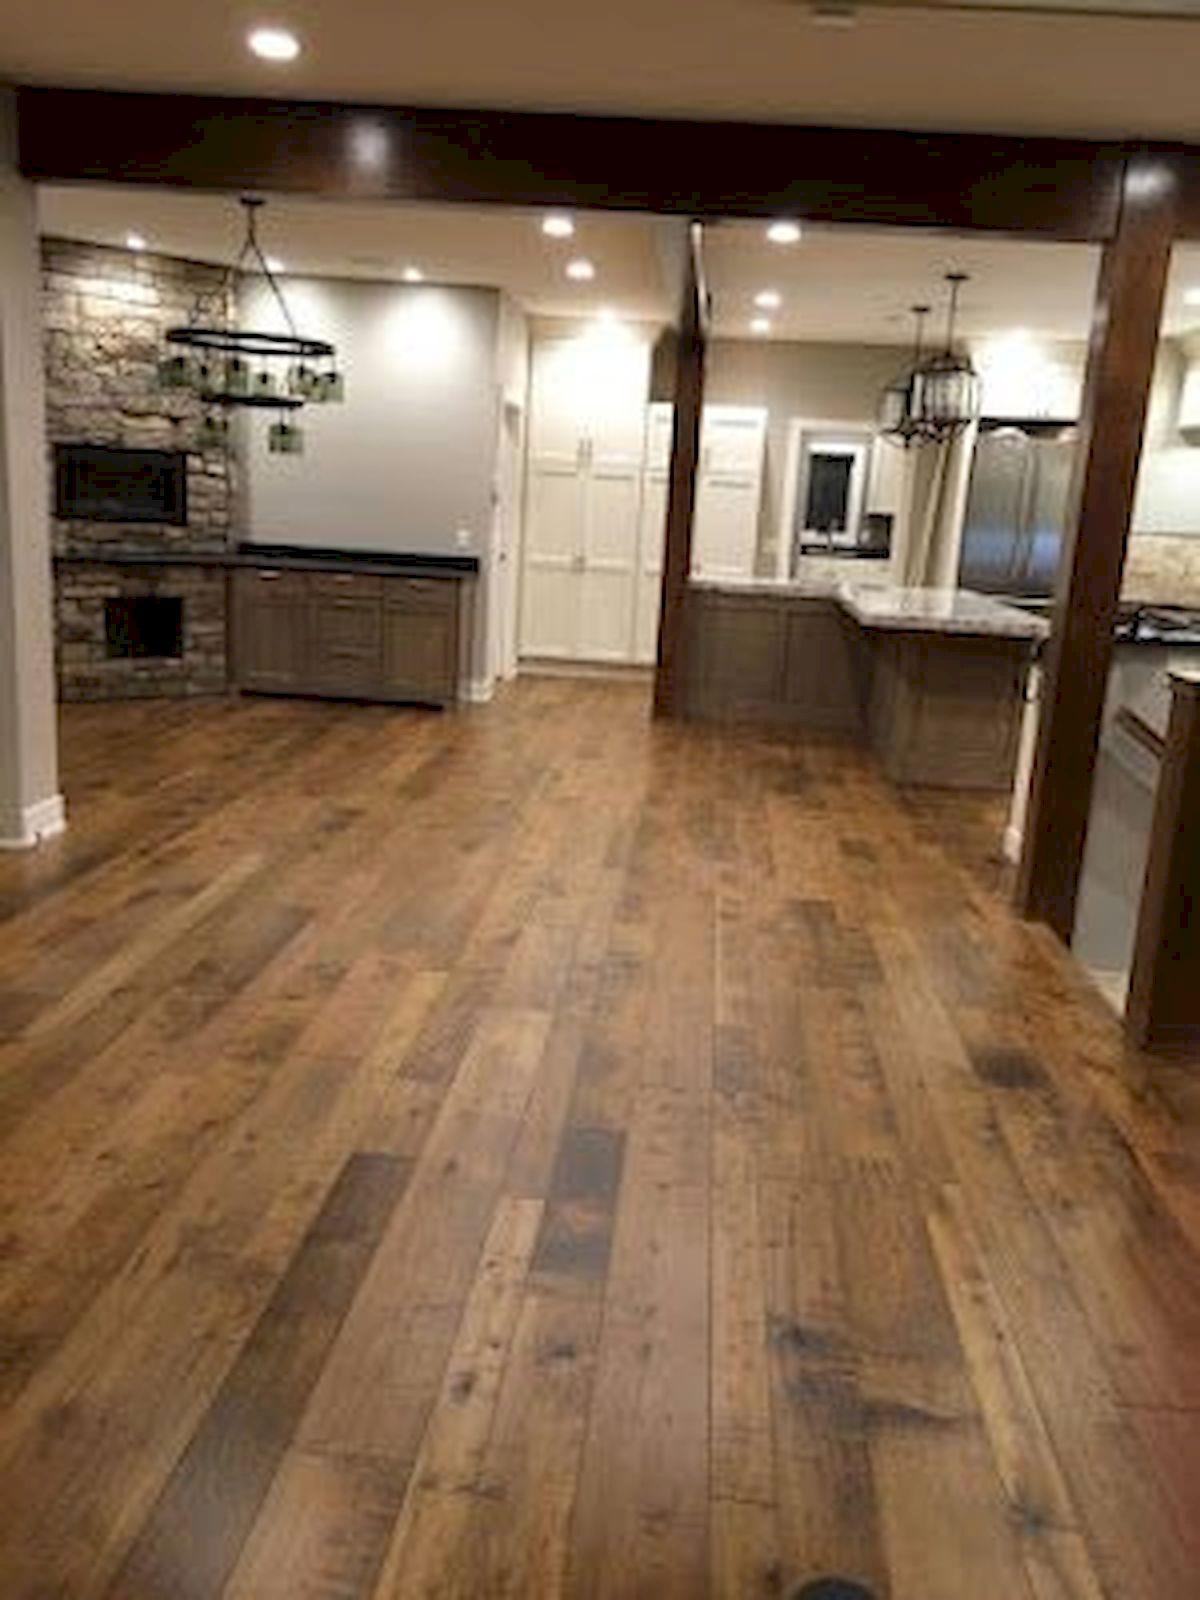 80 Gorgeous Hardwood Floor Ideas for Interior Home (60)